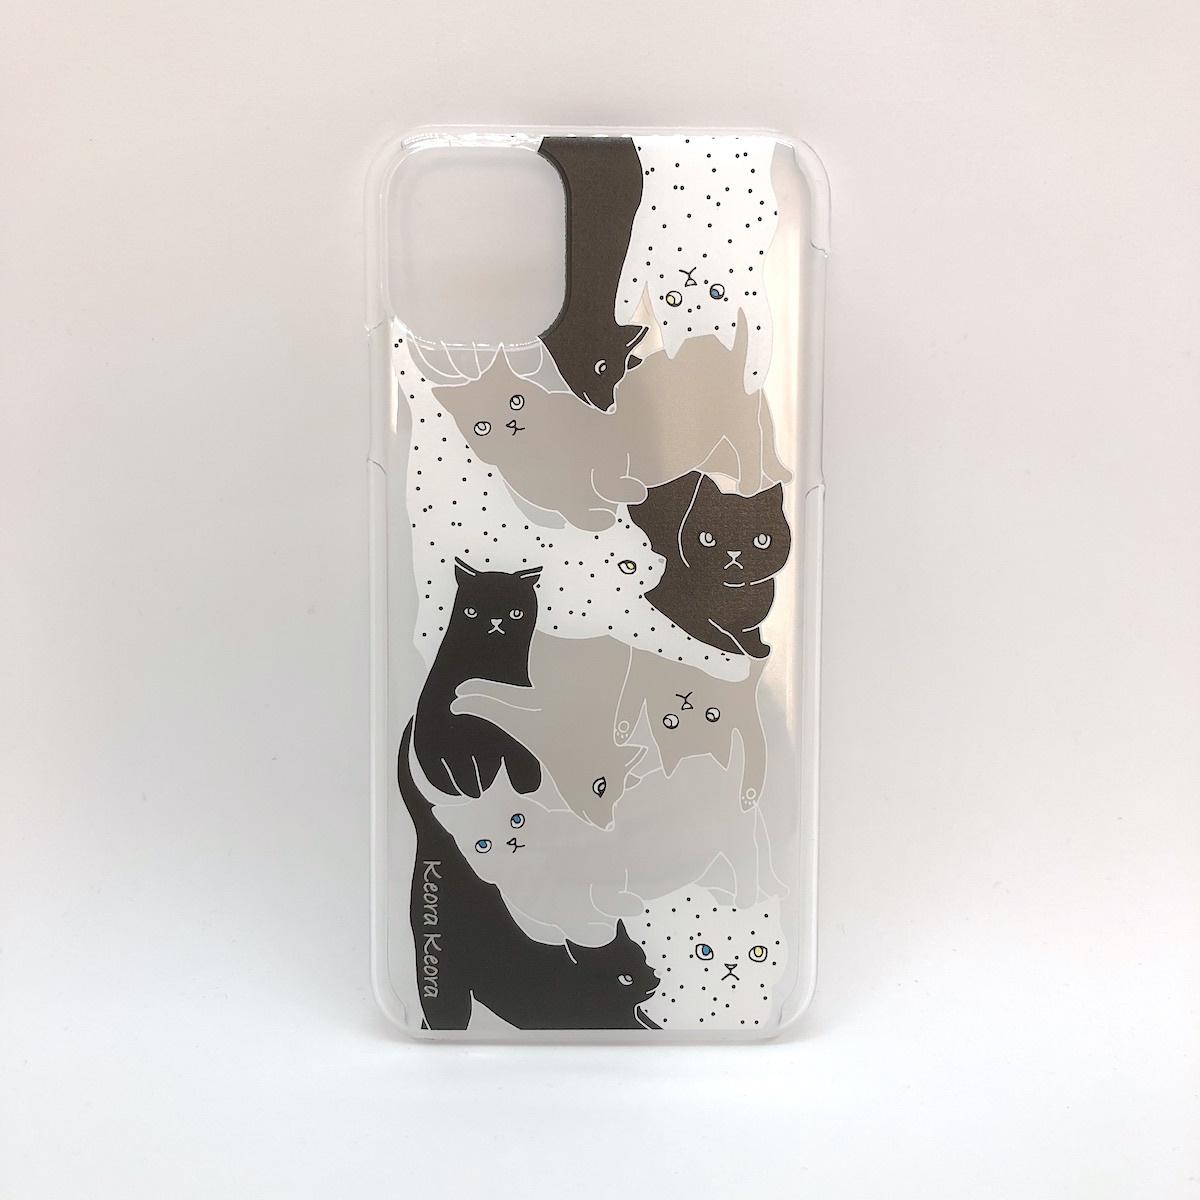 【iPhone11 Pro Max】アクリルケース CATS MONOTONE